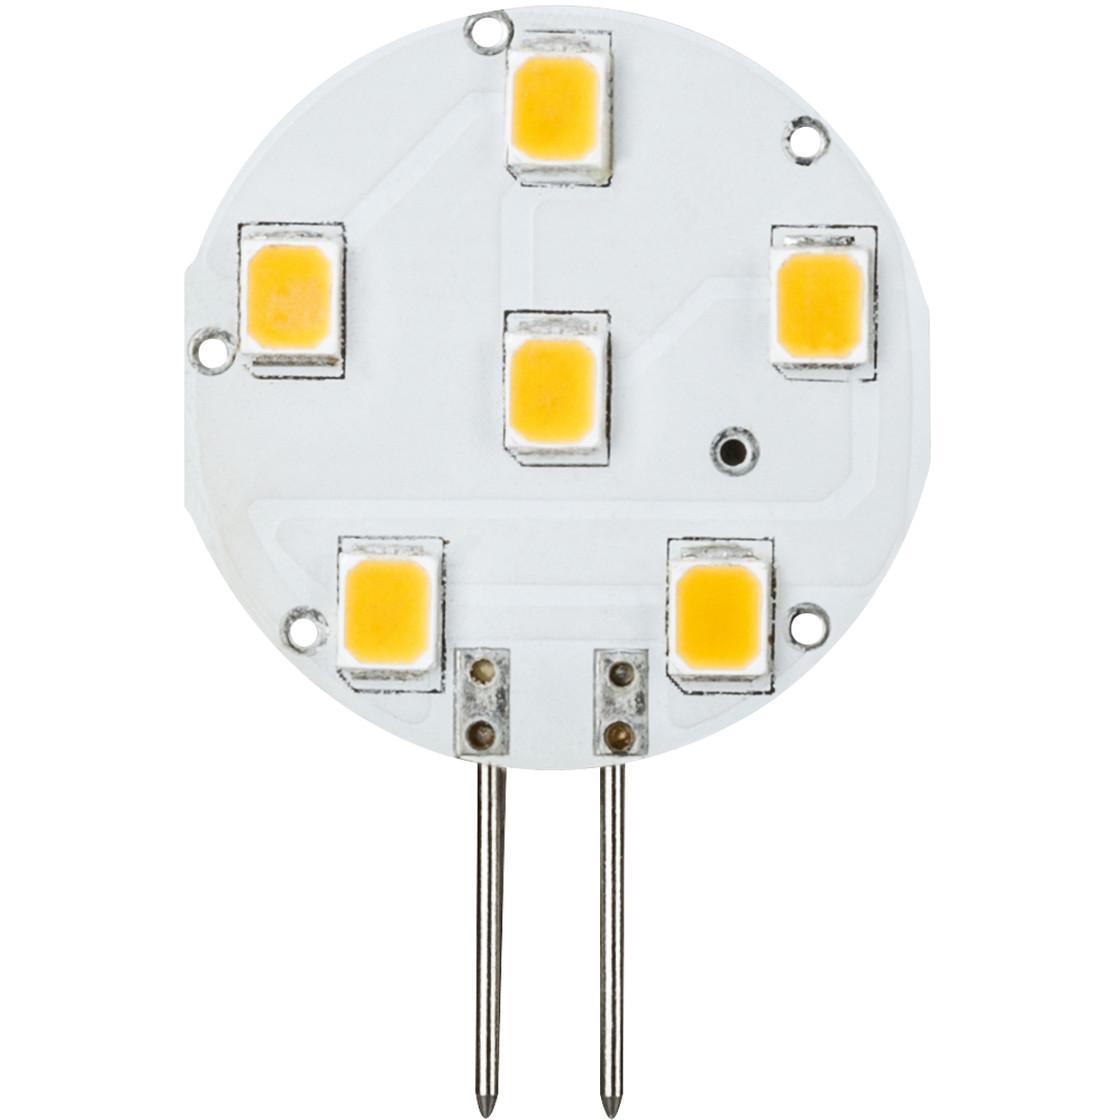 Paulmann 28287 Led Stiftsockel Spots Strahler 13w G4 Warmwei Circuit Series 5b15dledcircuitjpgd 2700k 599